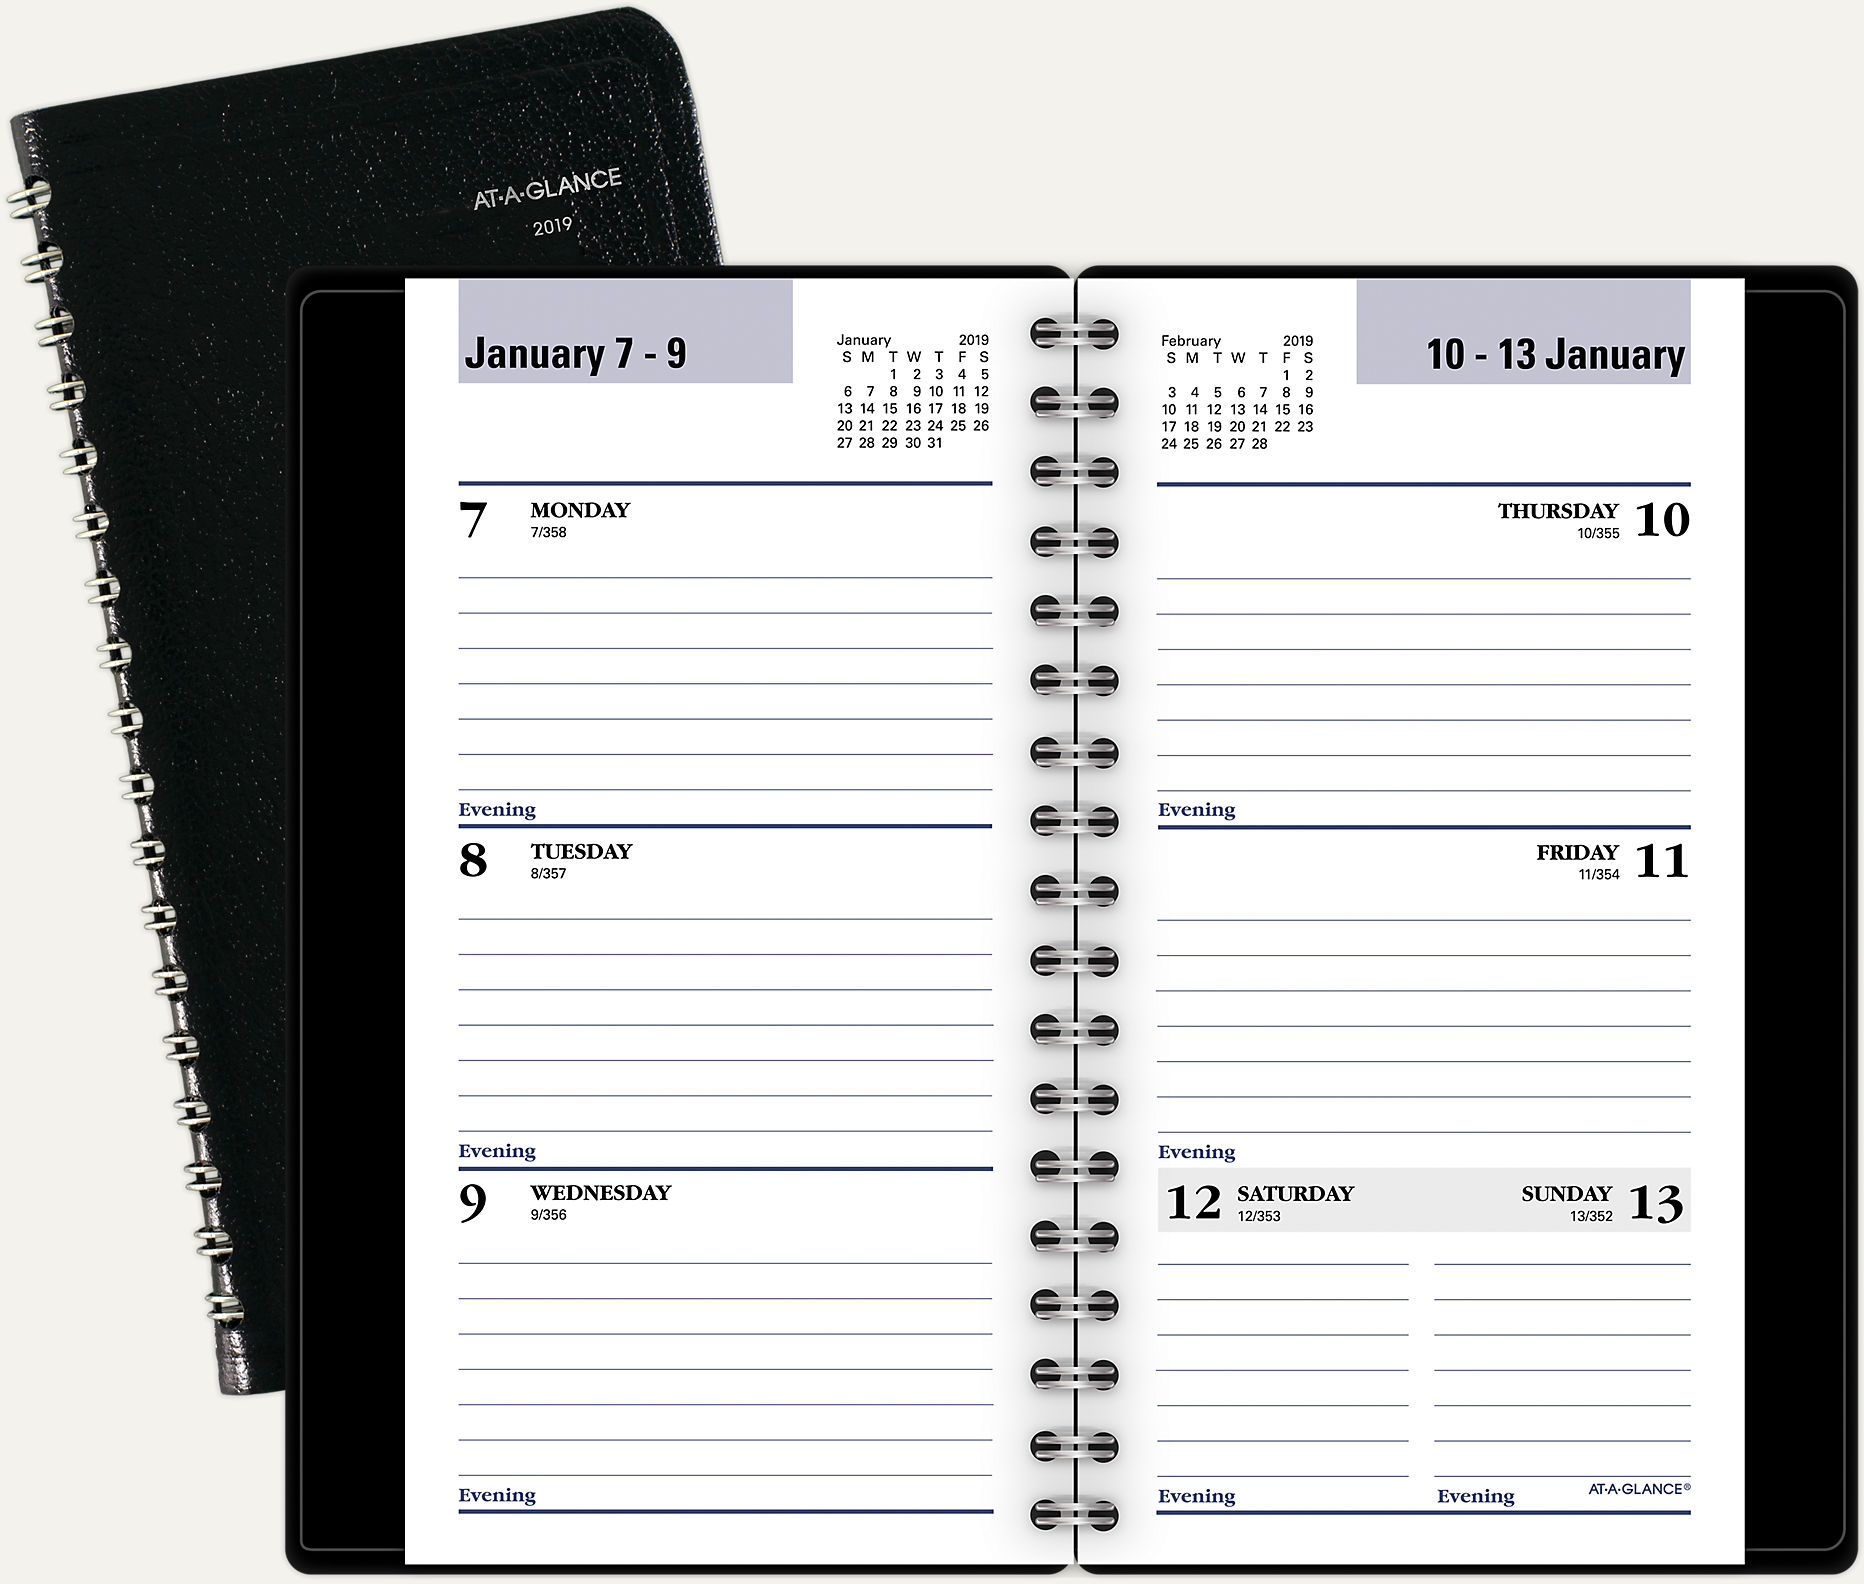 December 21 2019 Day Minder Printable Daily Calendar DayMinder Weekly Pocket Planner | G232 | AT A GLANCE